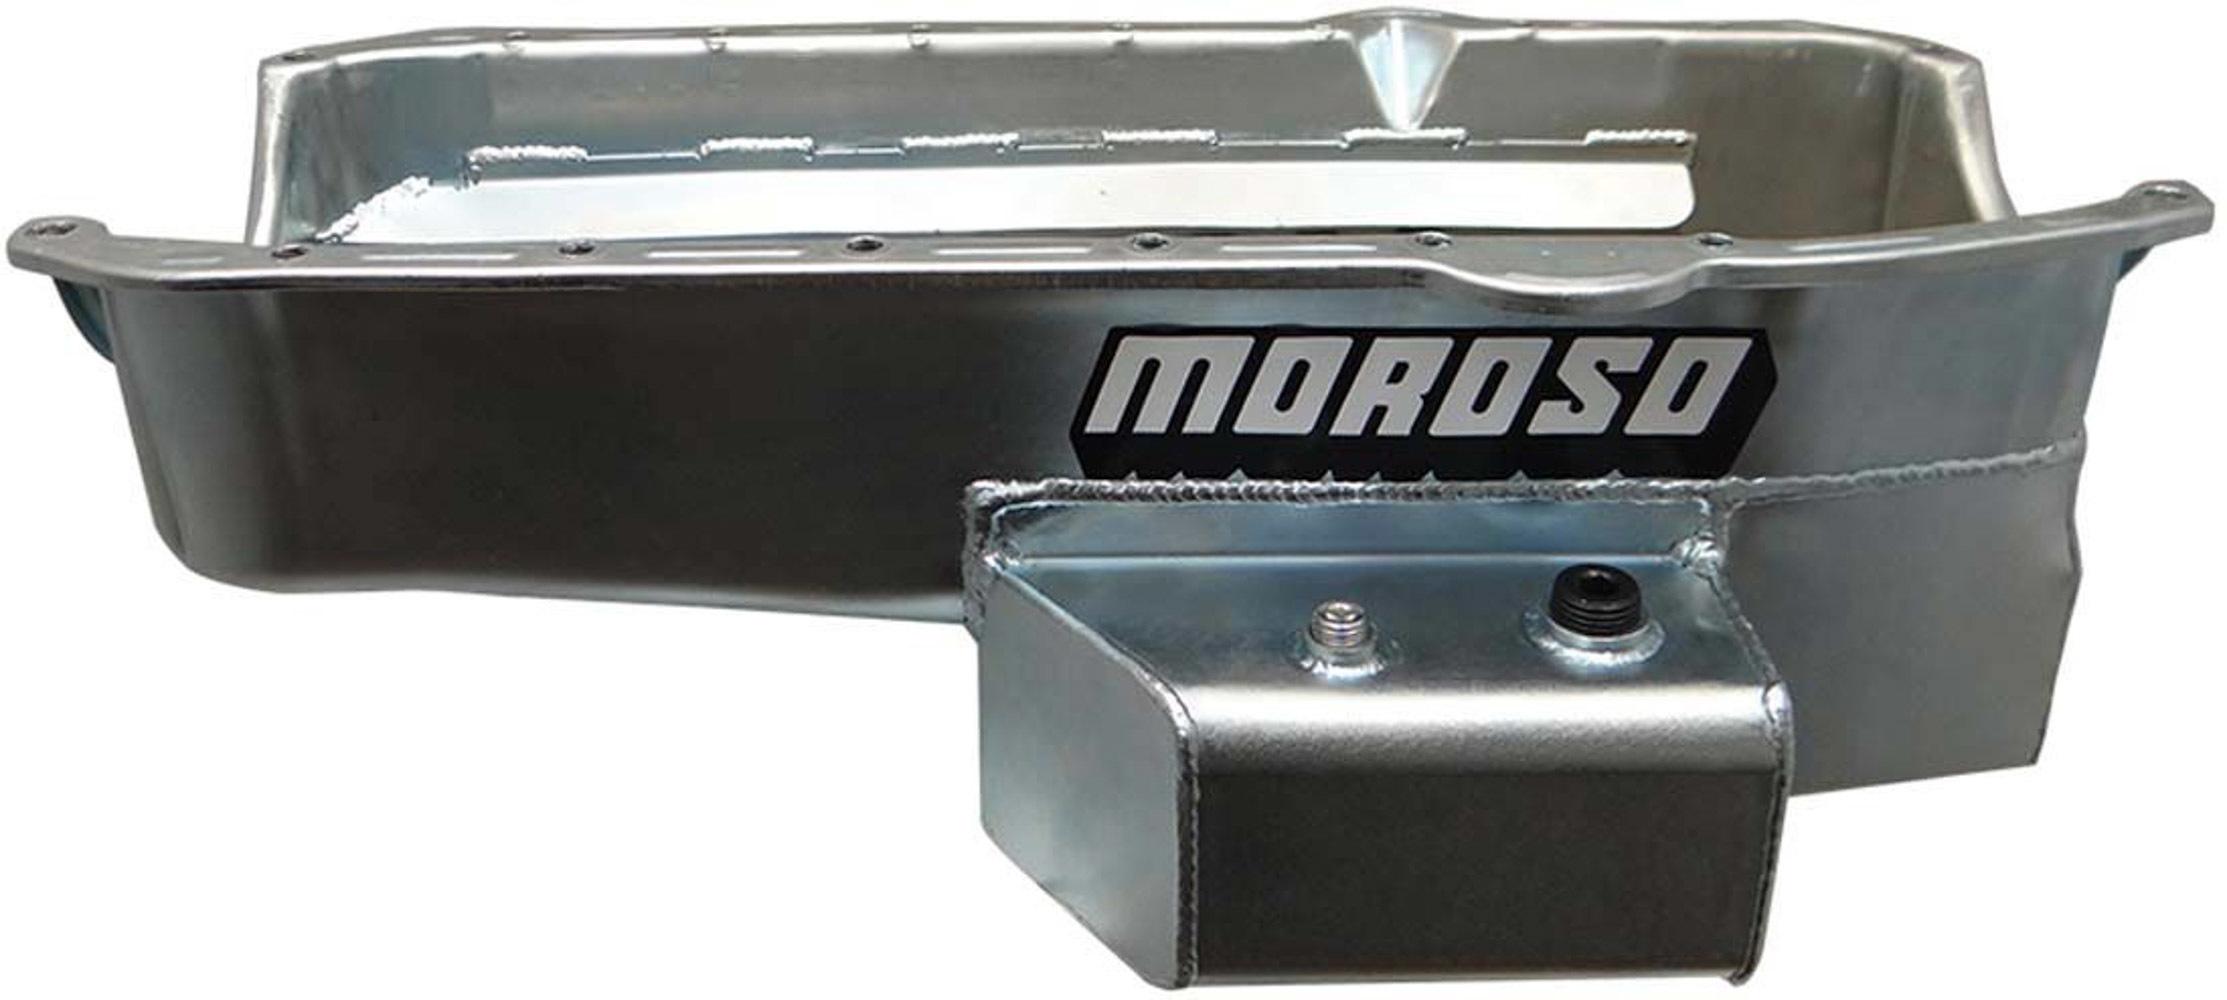 Moroso 21816 Engine Oil Pan, Street / Strip, Passenger Side Sump, 7 qt, 7 in Deep, Baffled, Steel, Zinc Oxide, Small Block Chevy, Each